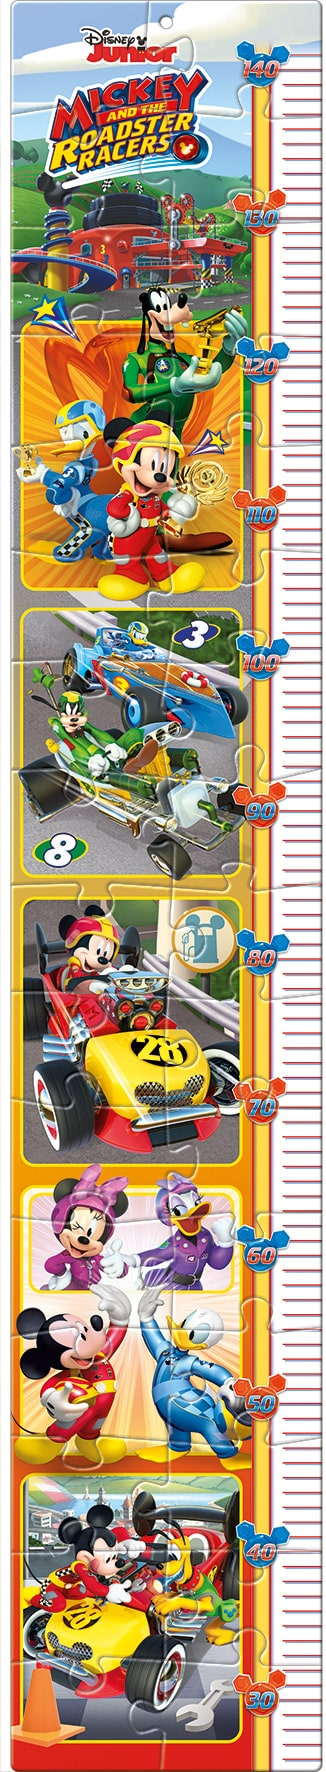 Mickey Roadster Racers Clementoni groeimeter